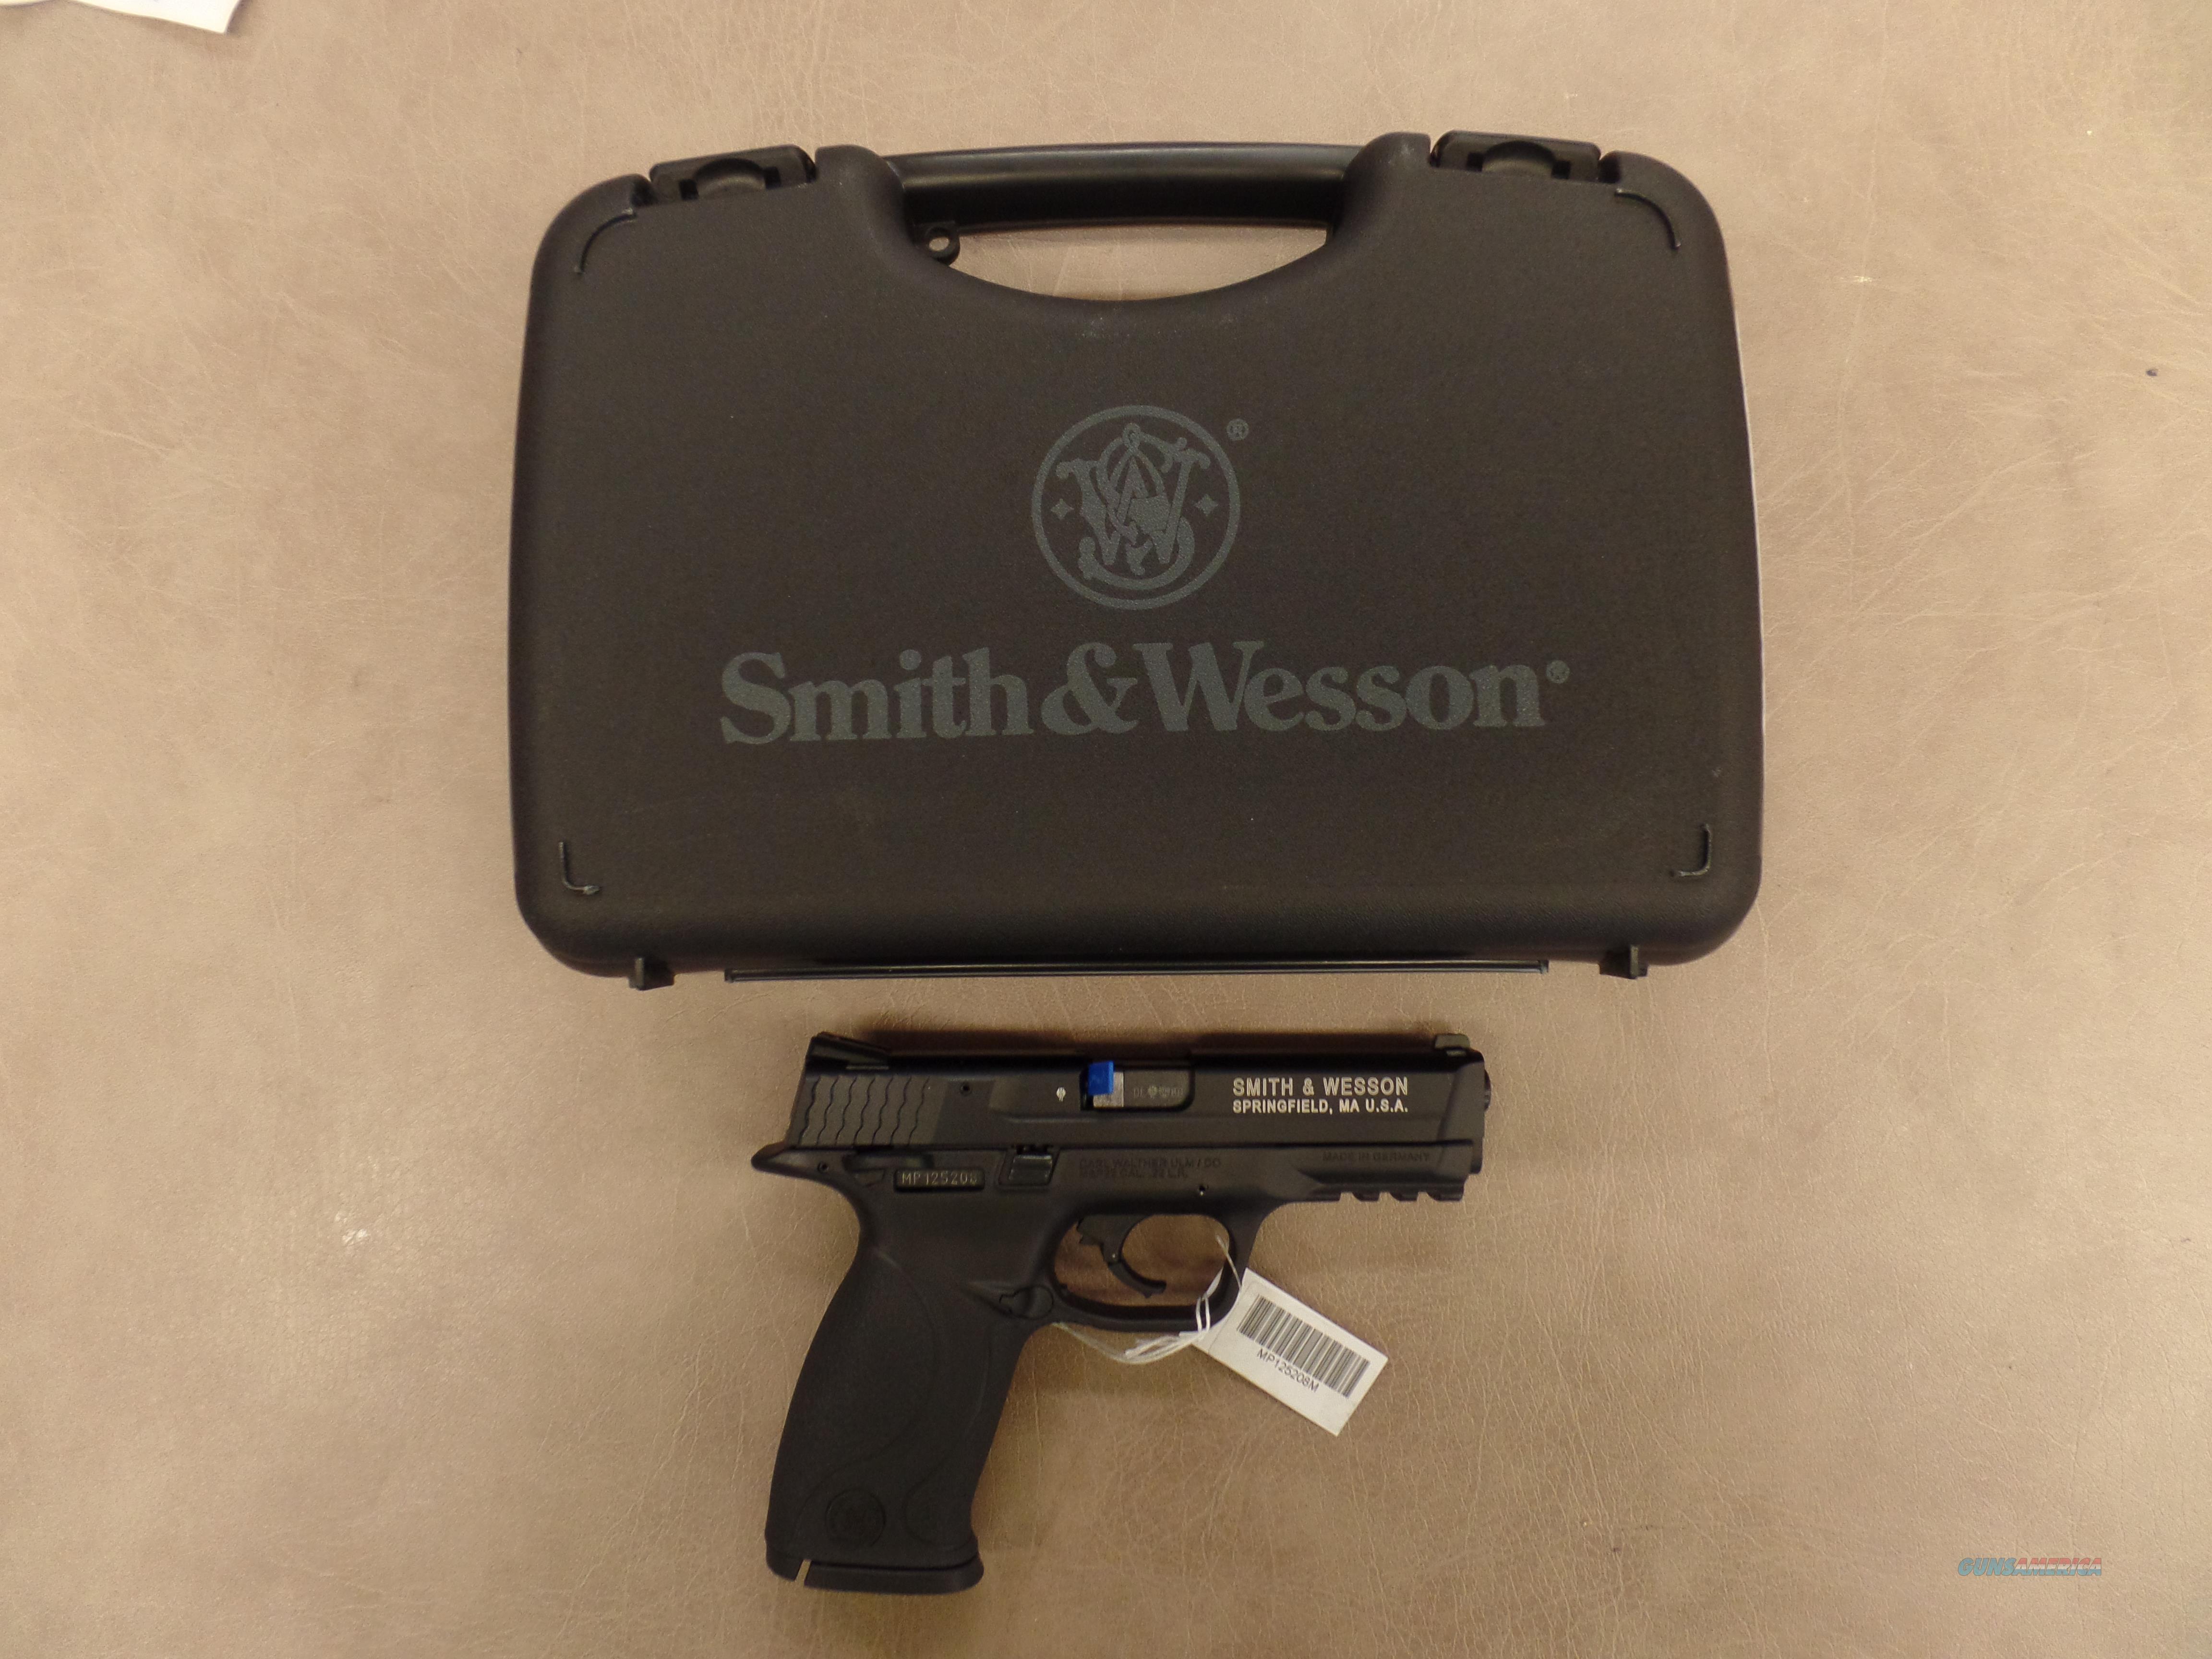 Smith & Wesson M&P 22  Guns > Pistols > Smith & Wesson Pistols - Autos > .22 Autos